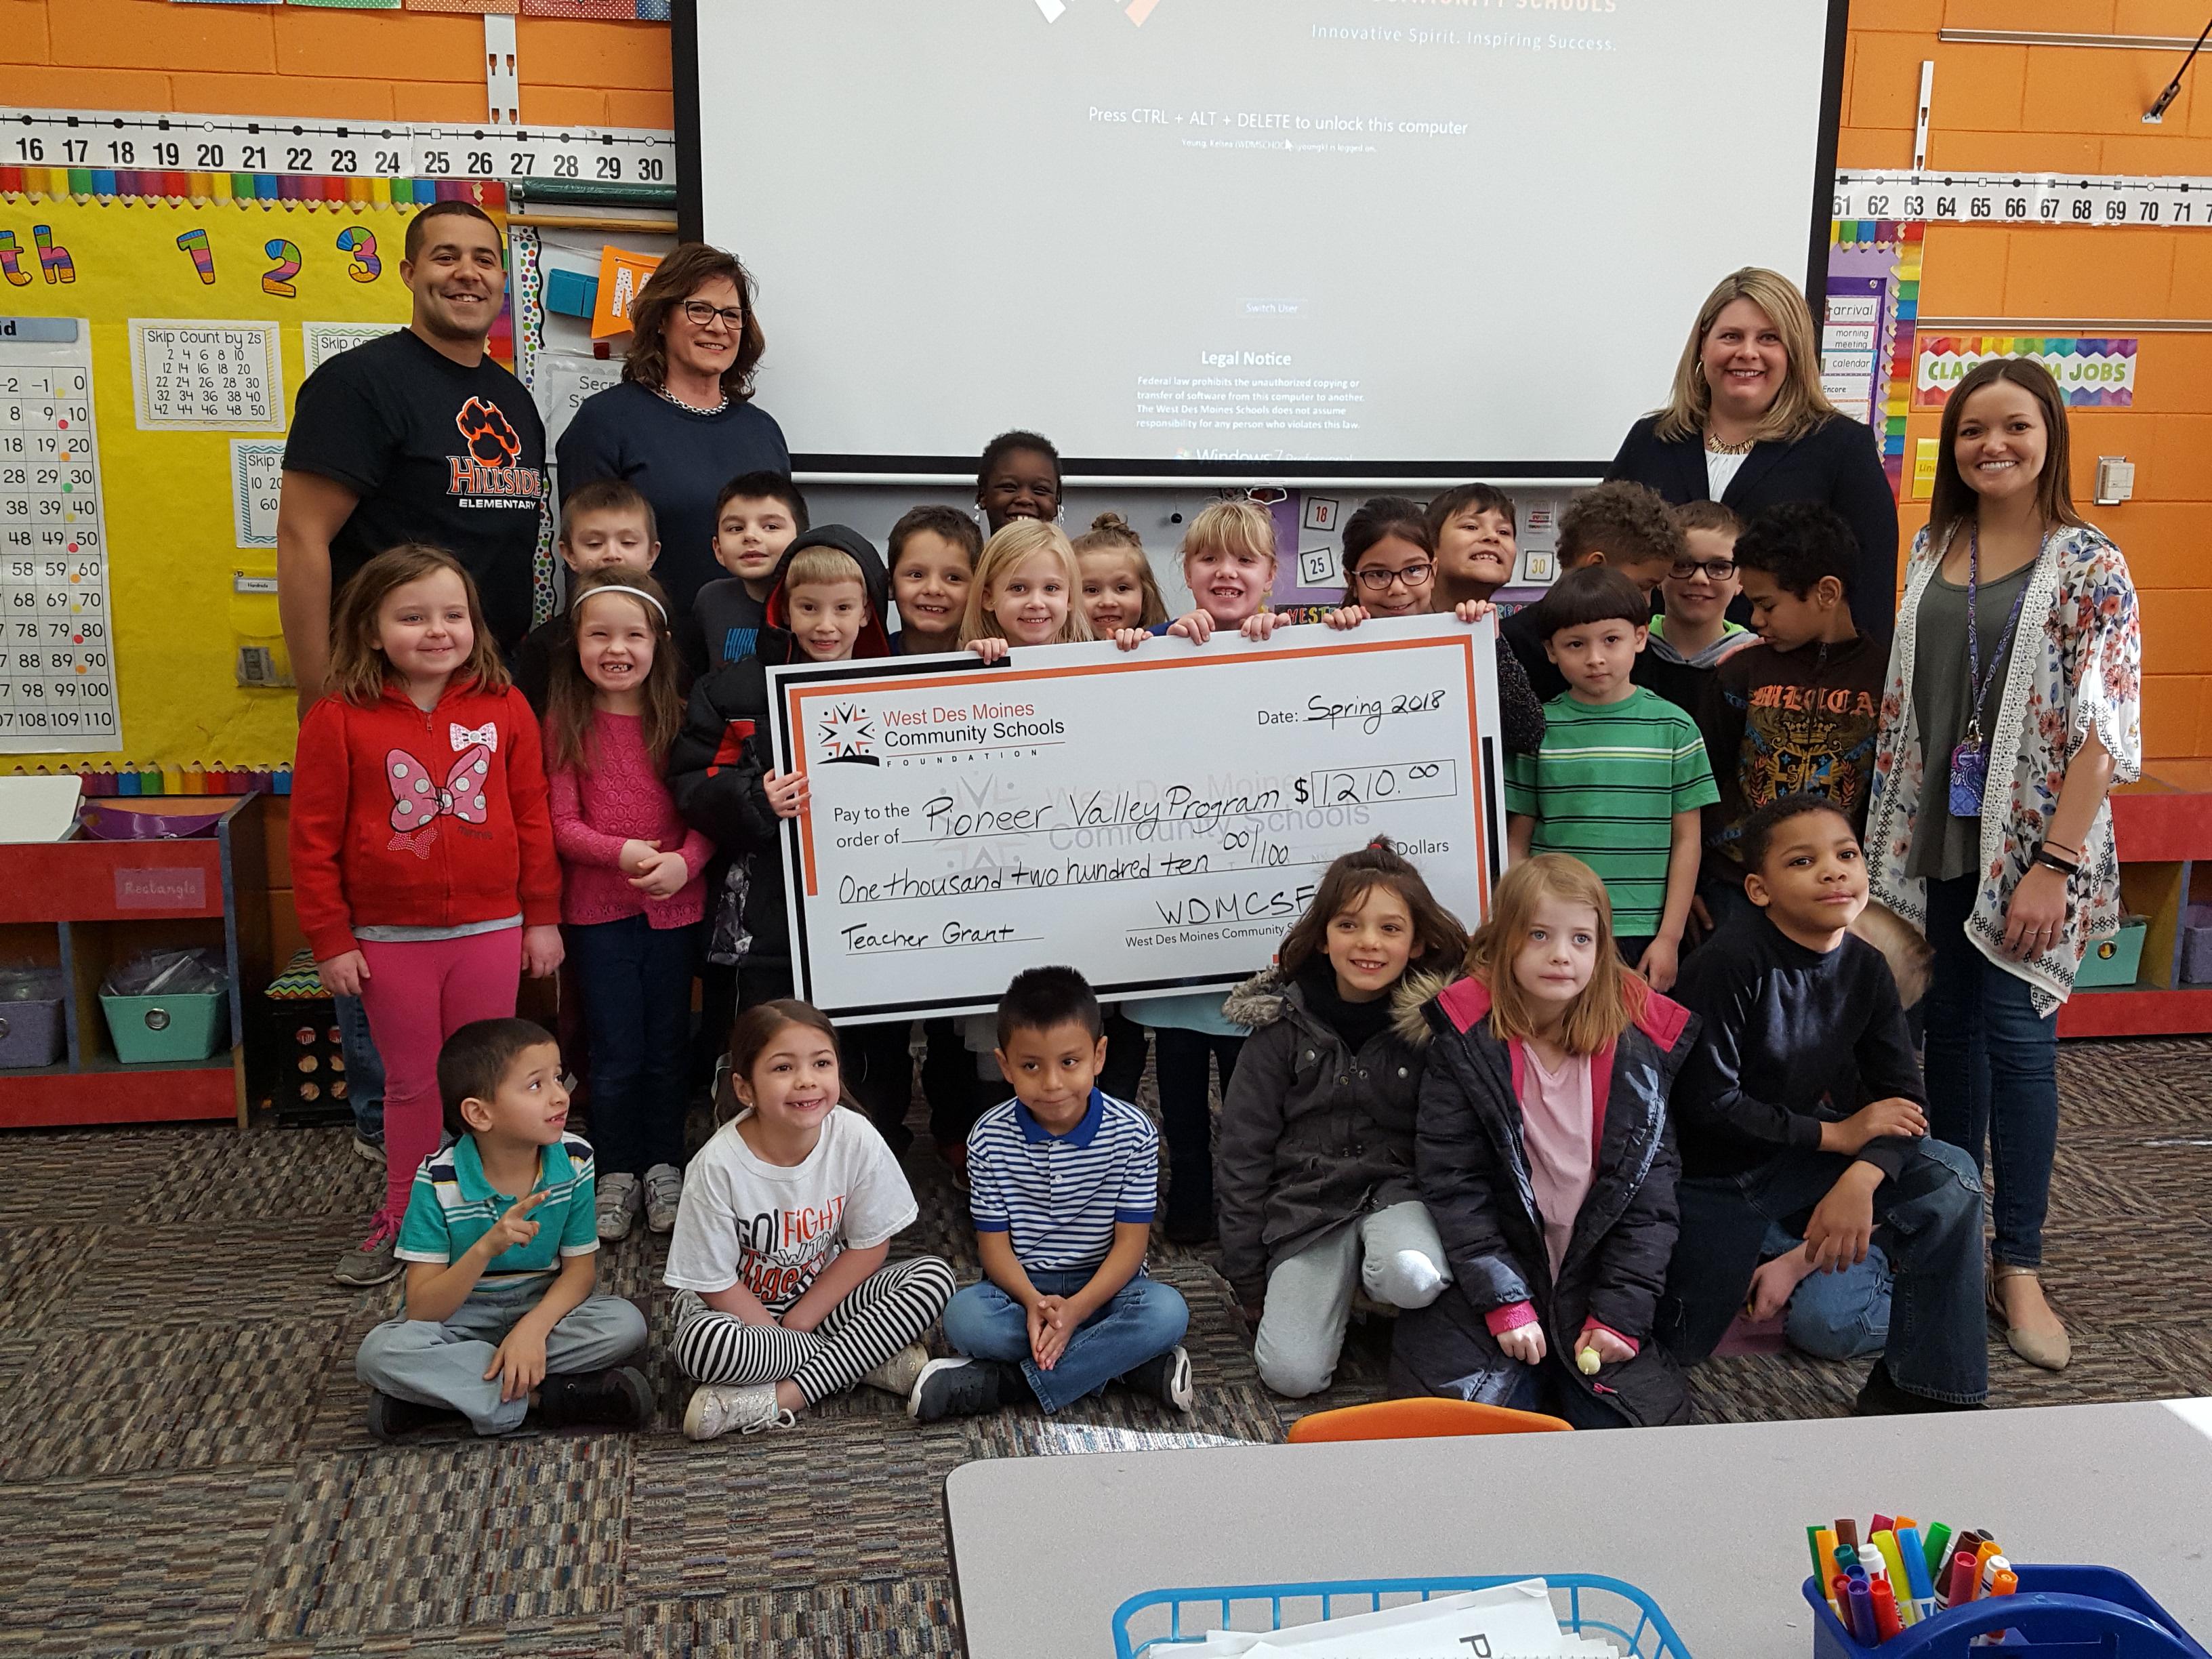 Pioneer Valley Program Grant